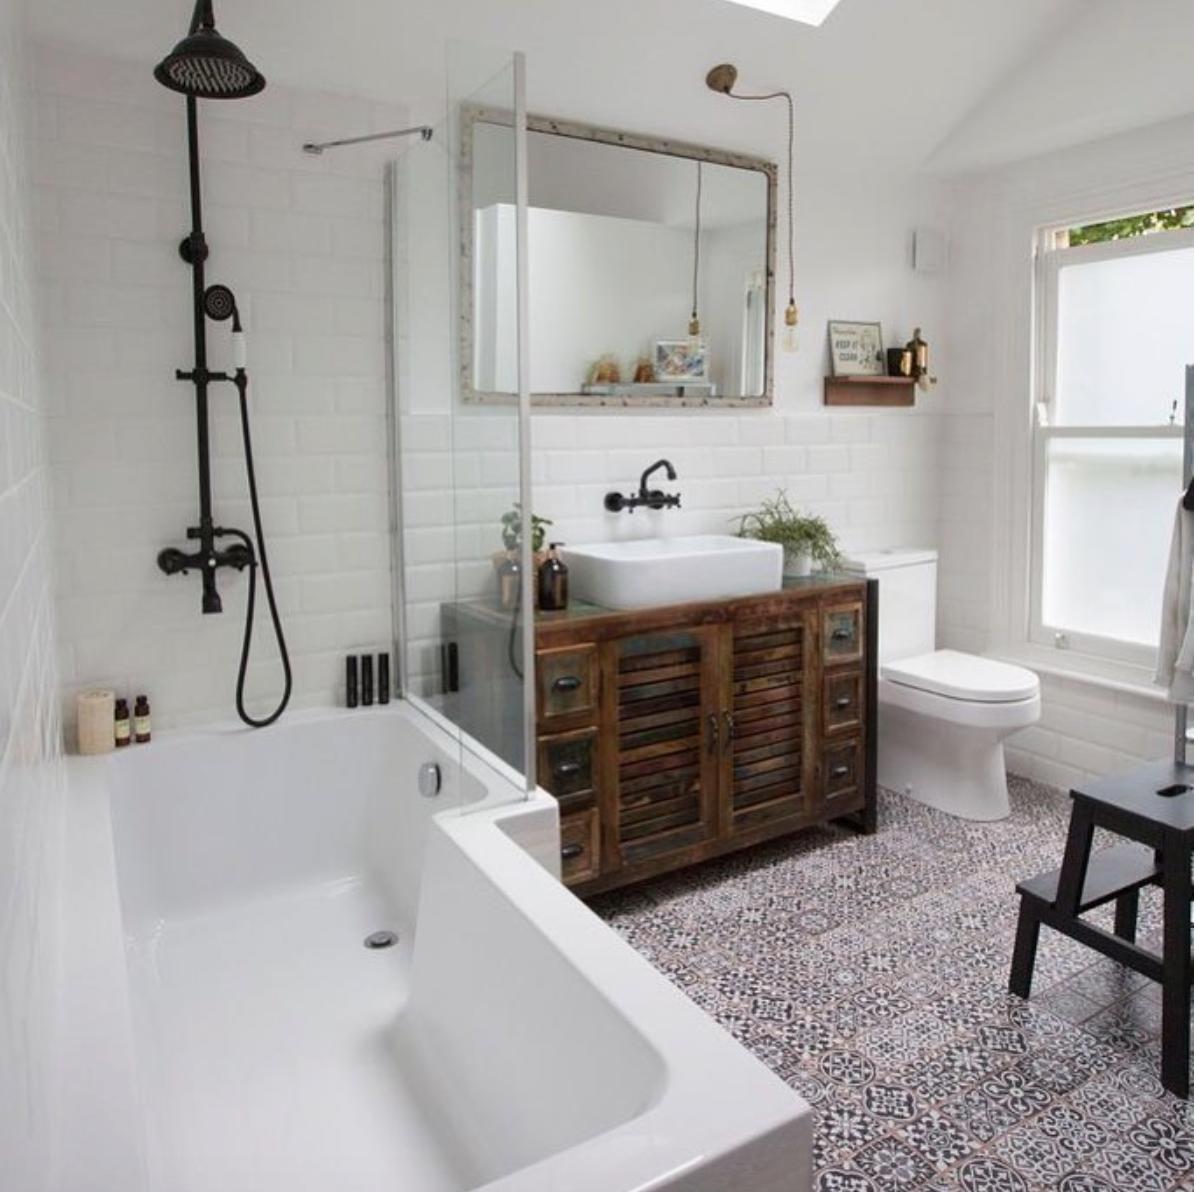 Stylish Bathroom Top Bathroom Design Bathrooms Remodel